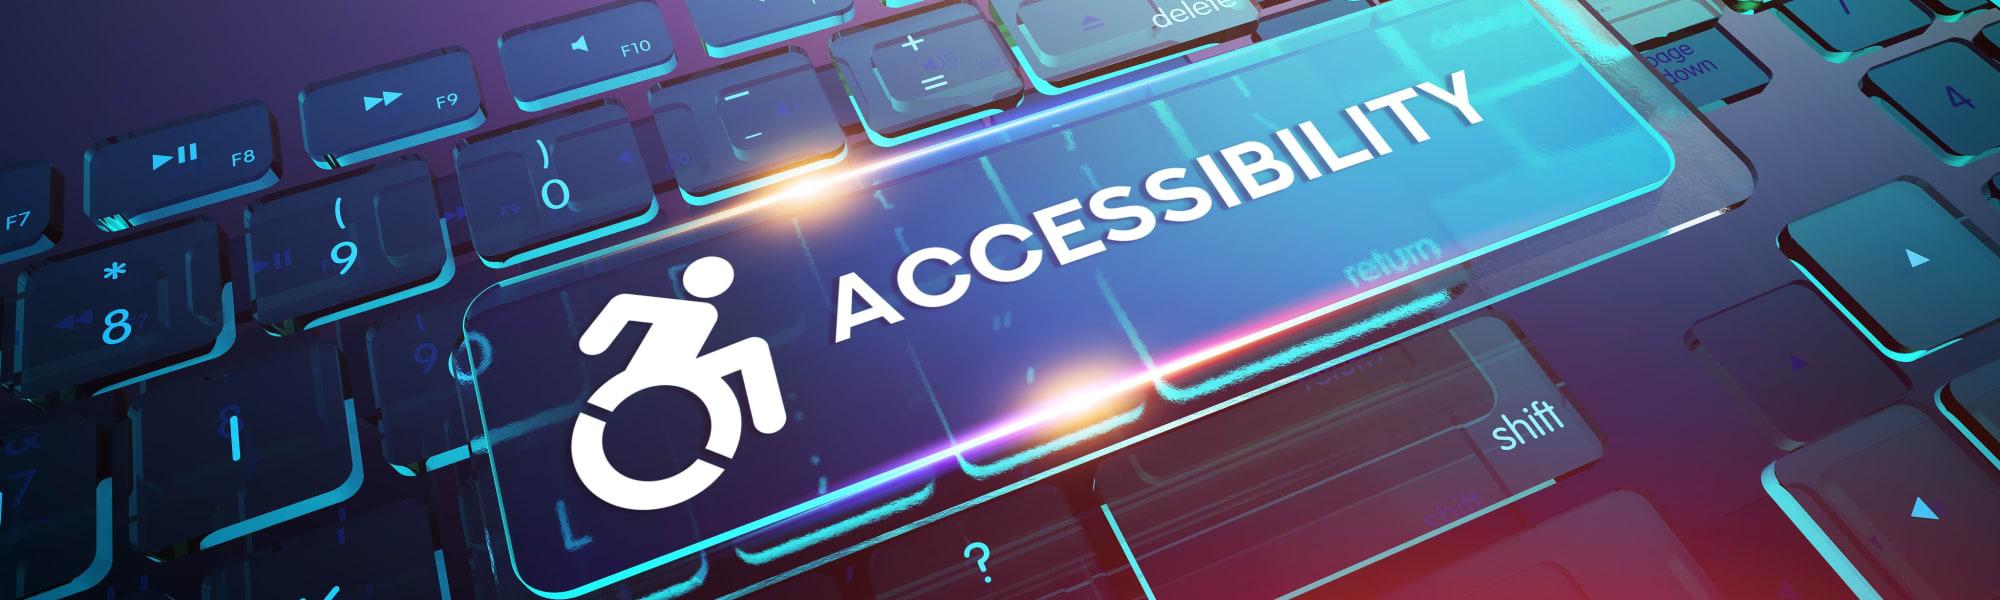 Accessibility policy for Olympus at Daybreak in South Jordan, Utah